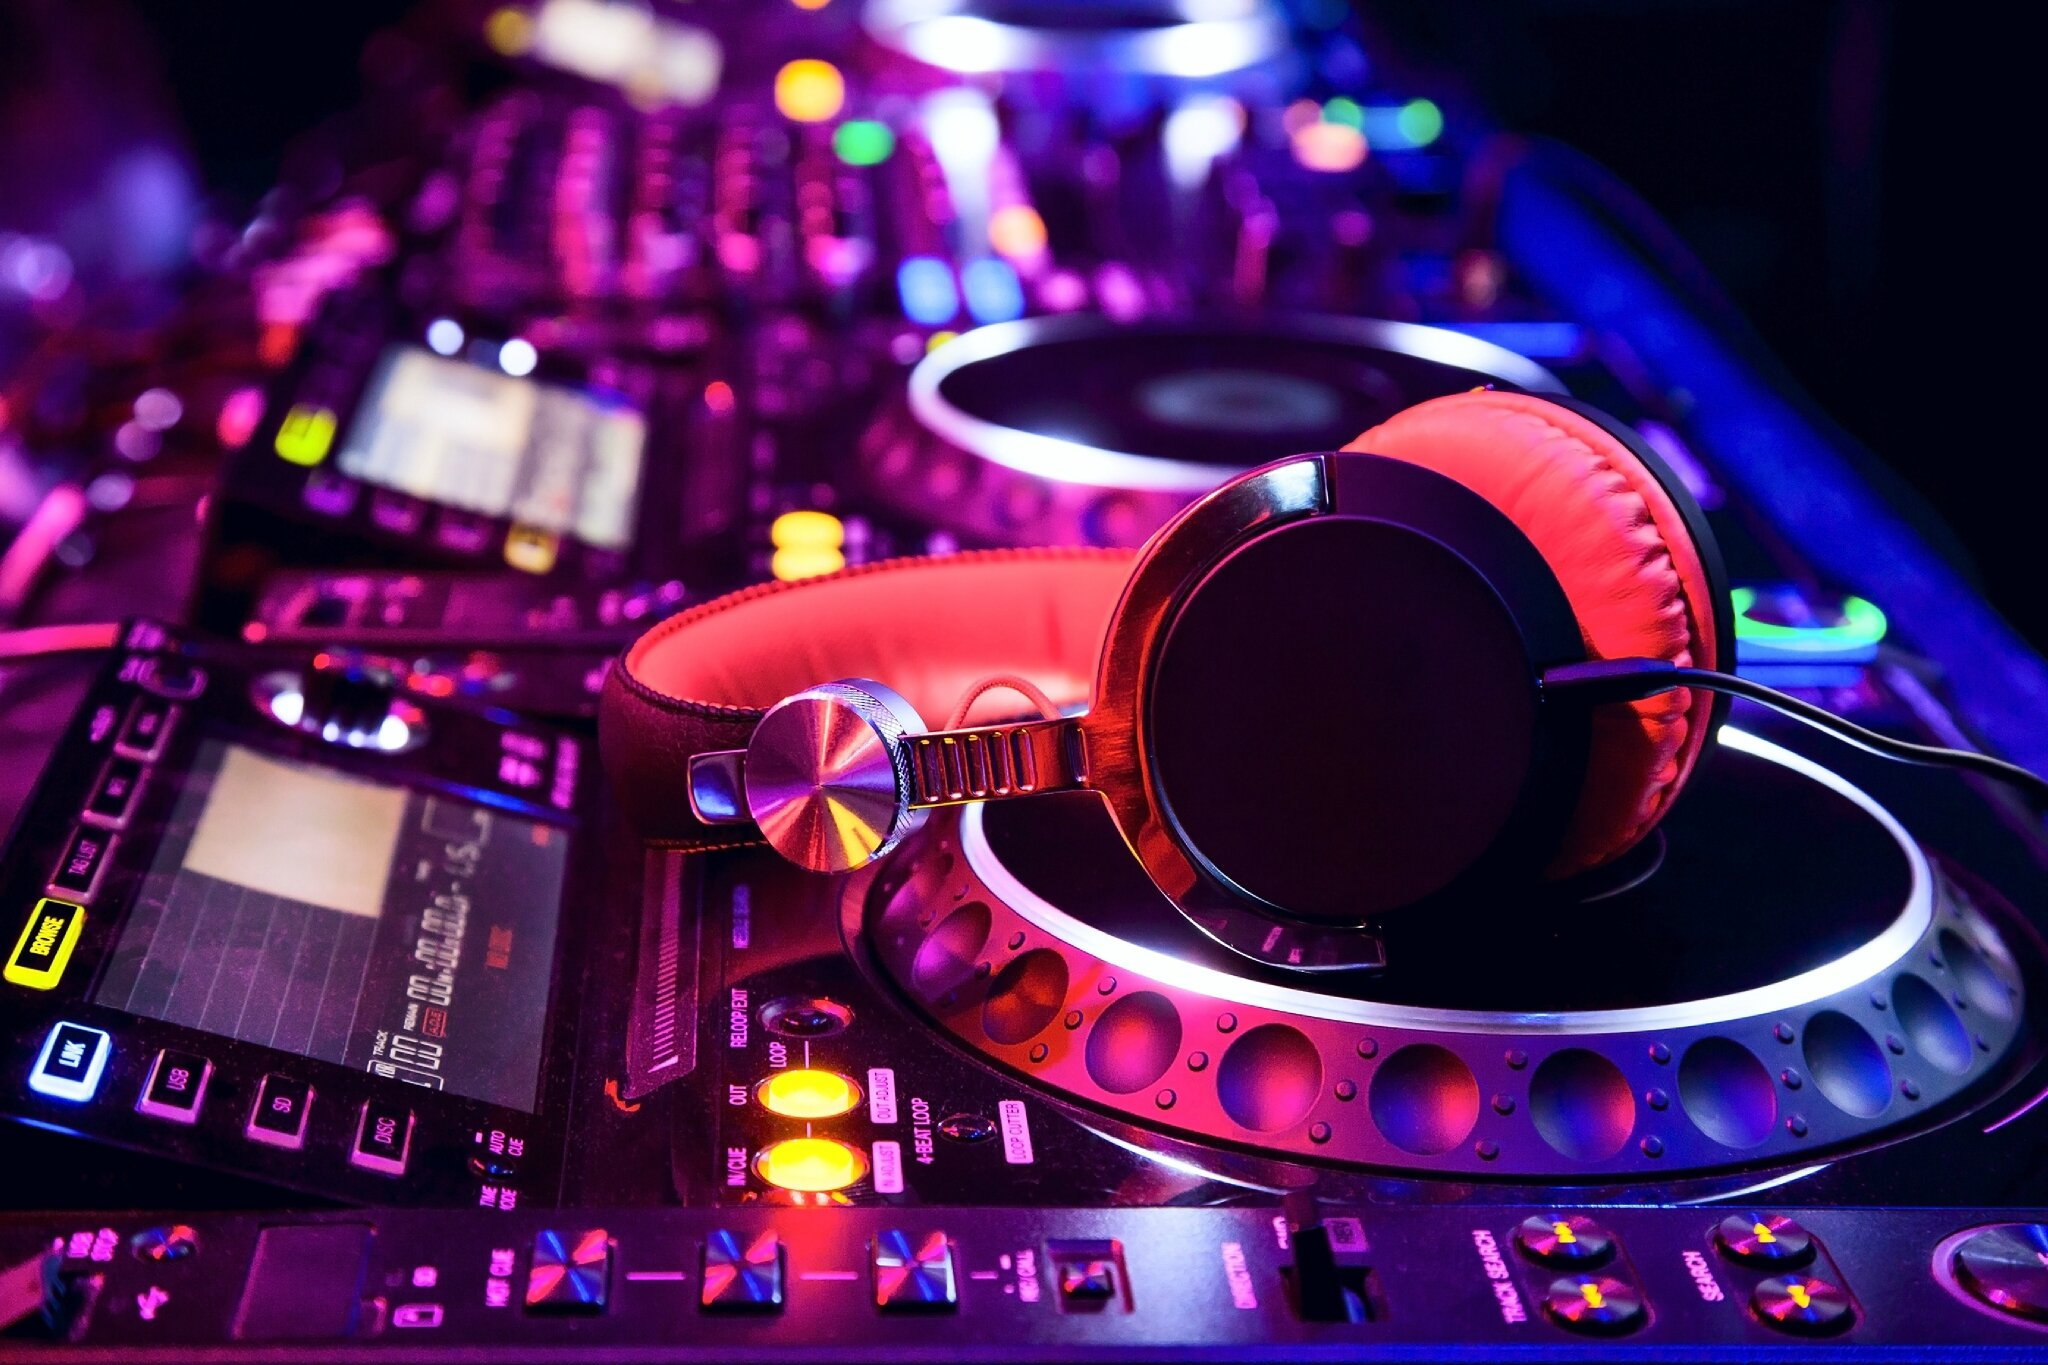 DJ pour anniversaire casablanca 0664000445 dj casablanca dj casablanca anniversaire decoration anniversaire casablanca anima